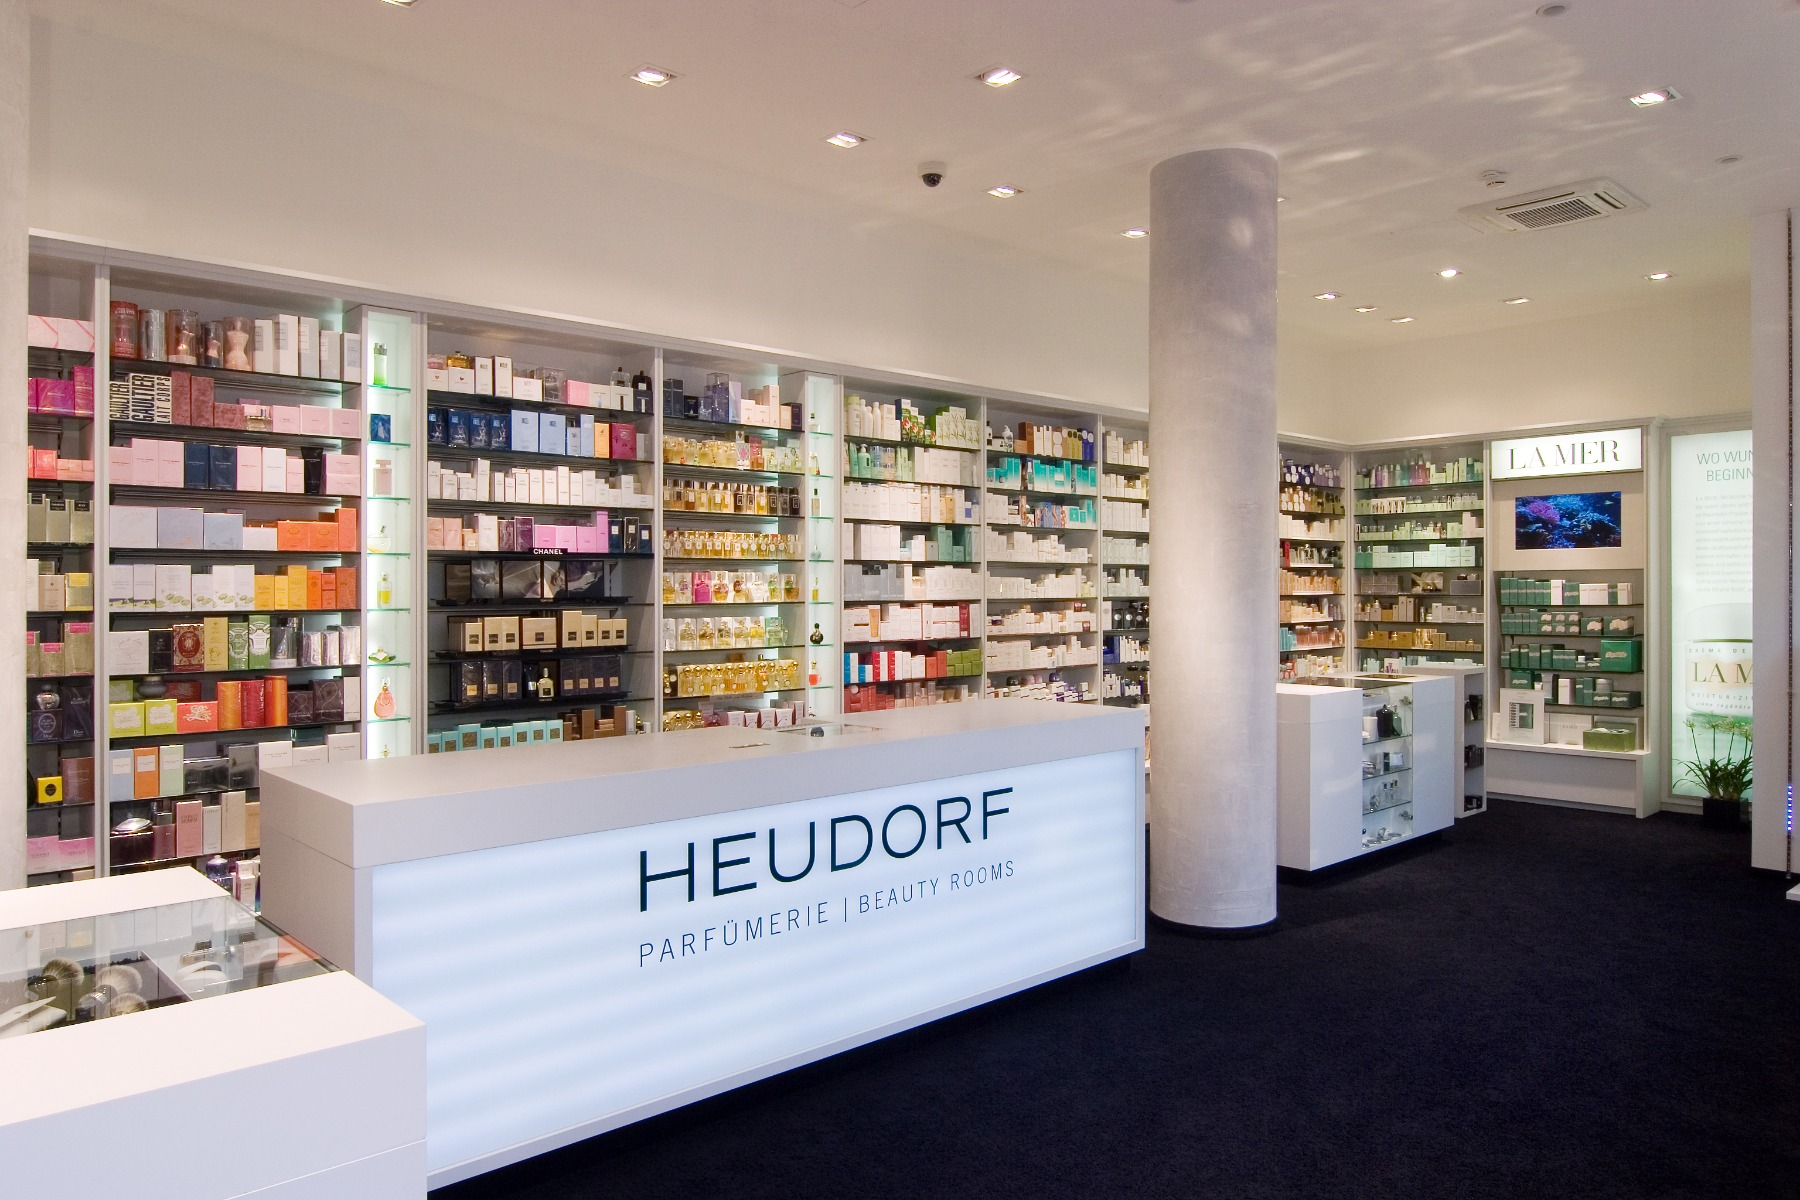 Verkaufsraum Parfümerie Heudorf